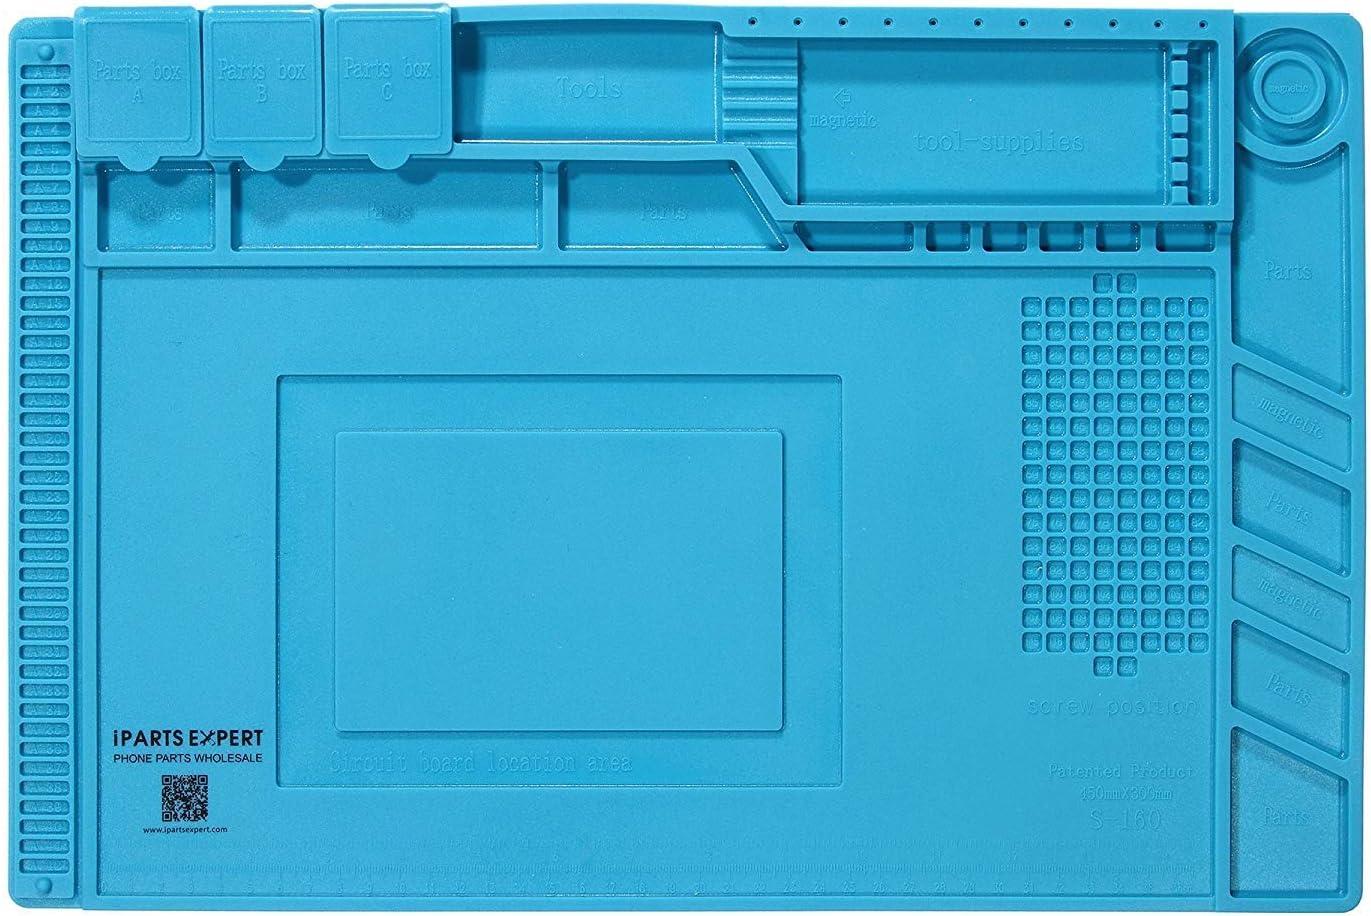 61 in 1 Magnetic Screwdriver Set Anti-Static Soldering Mat and 61 in 1 Magnetic Screwdriver Set